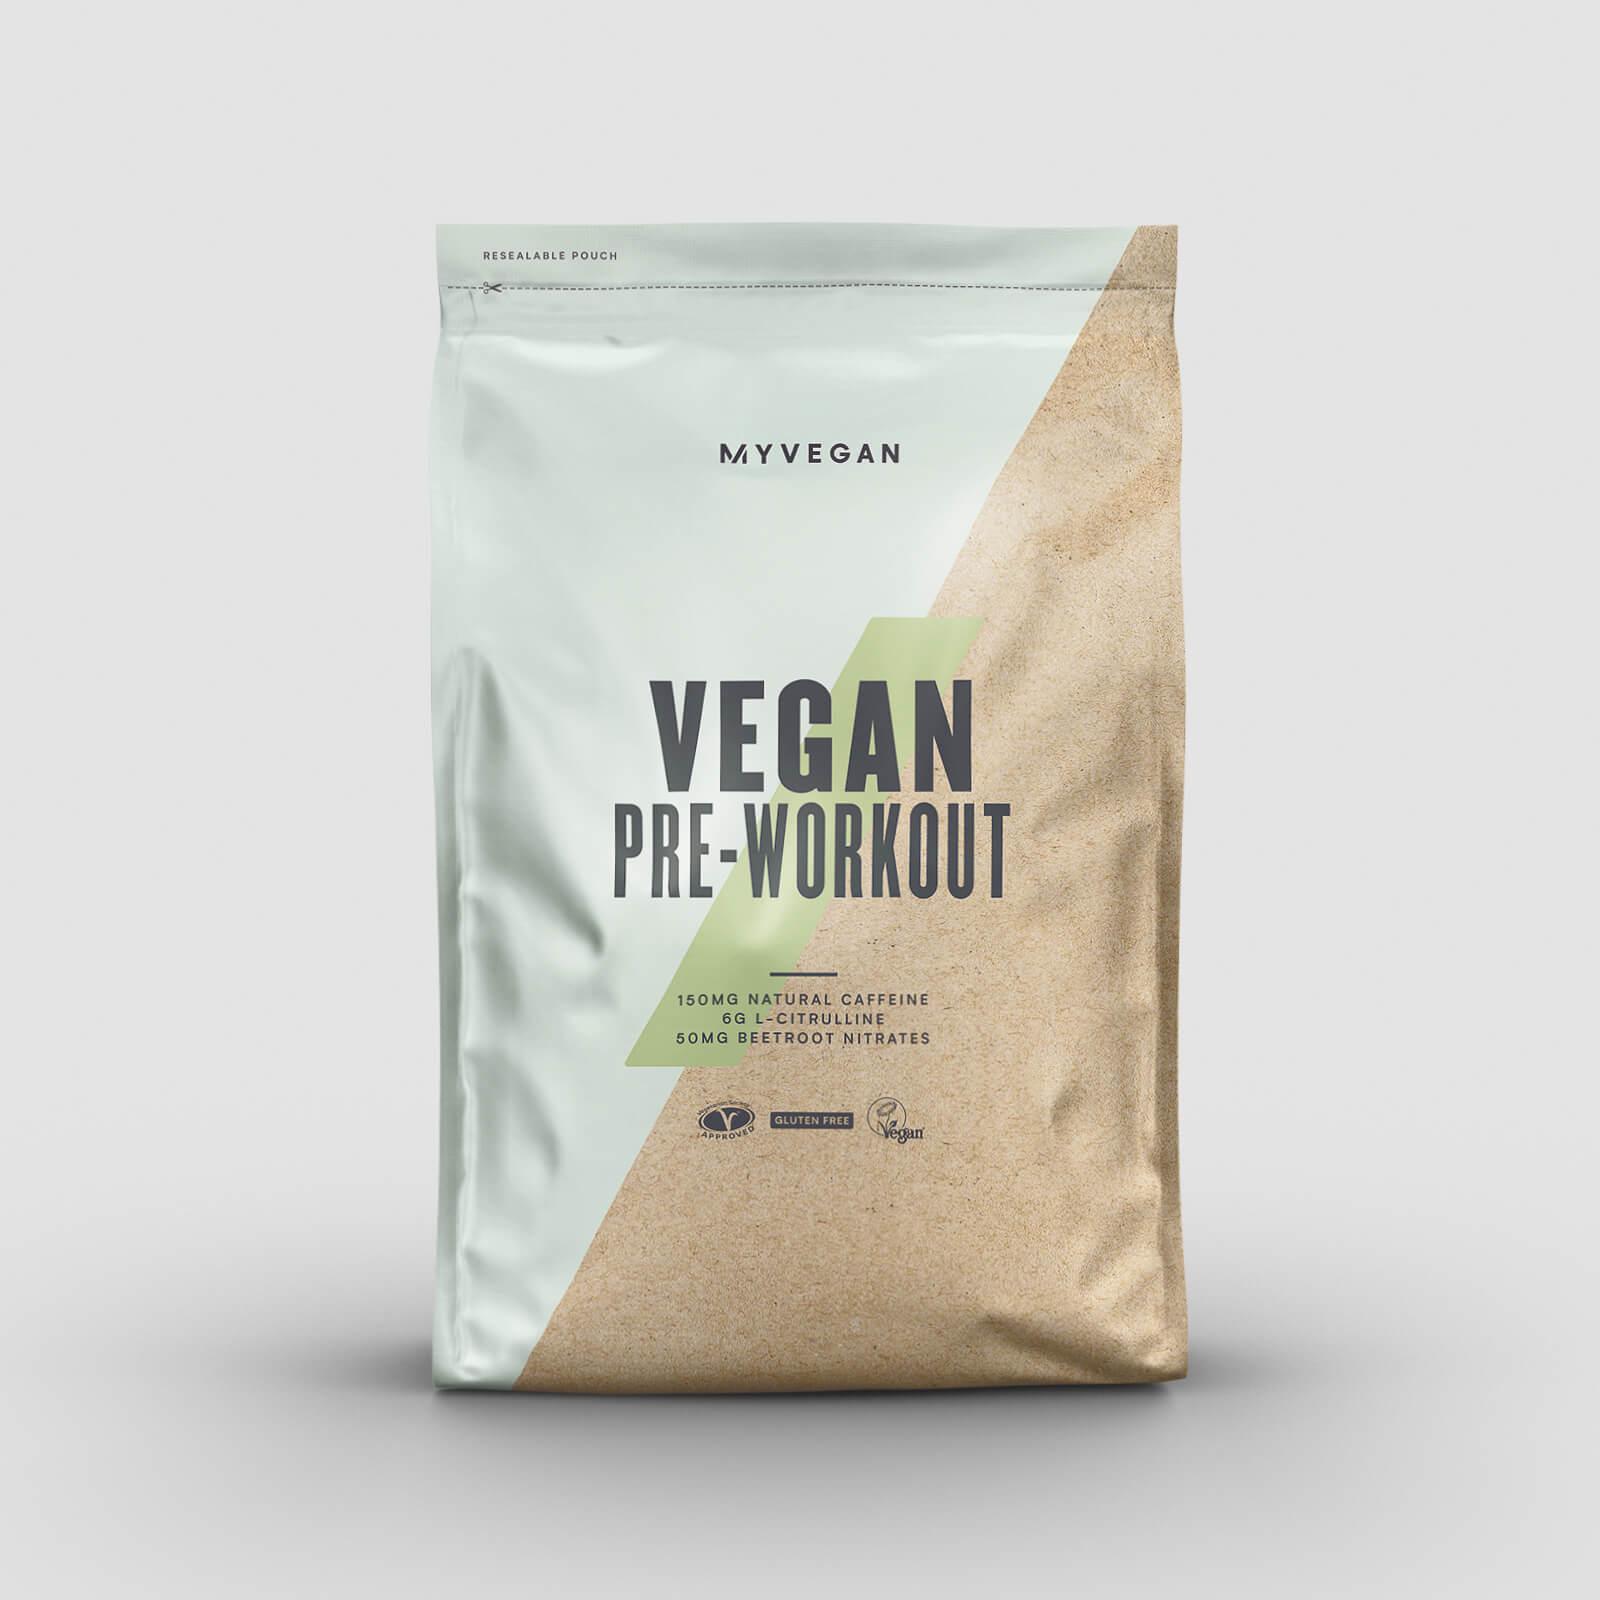 Myprotein Vegan Pre-Workout - 250g - Lemon Tea